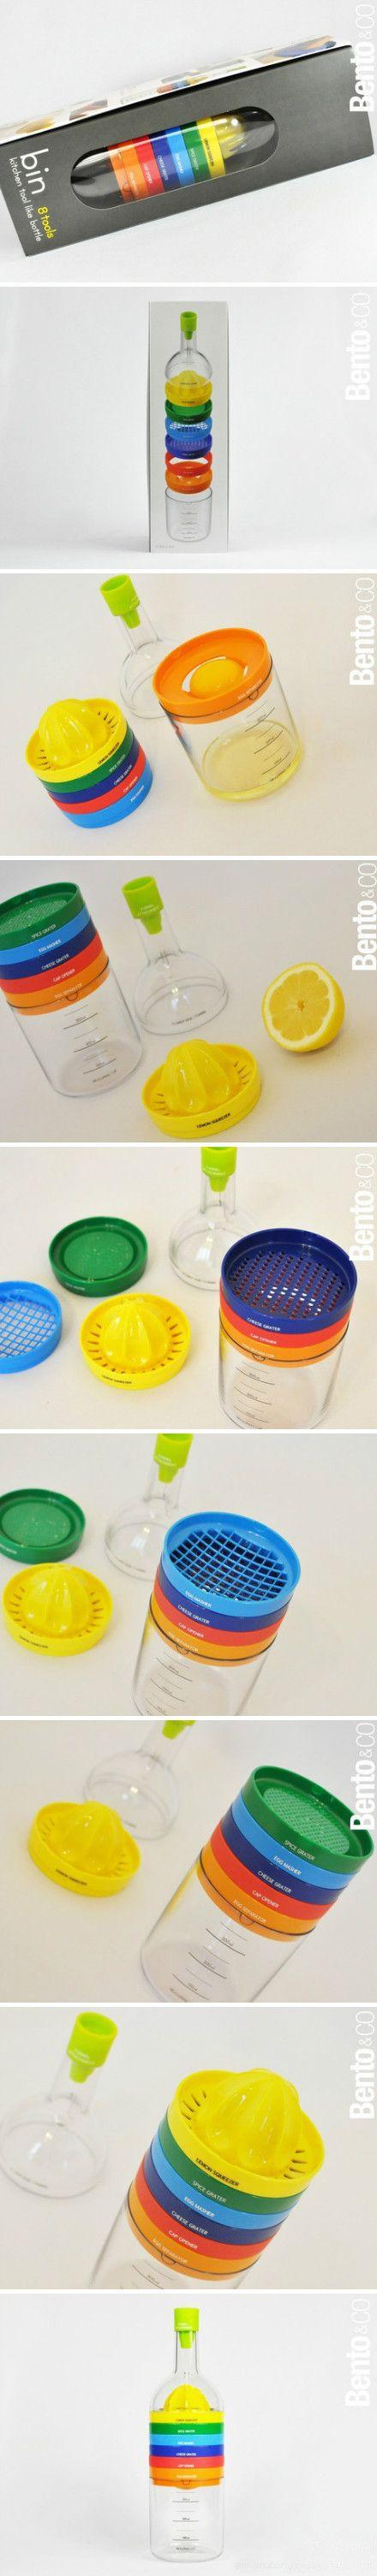 8-in-one kitchen set: egg yolk egg white separator, juicer, funnel and more